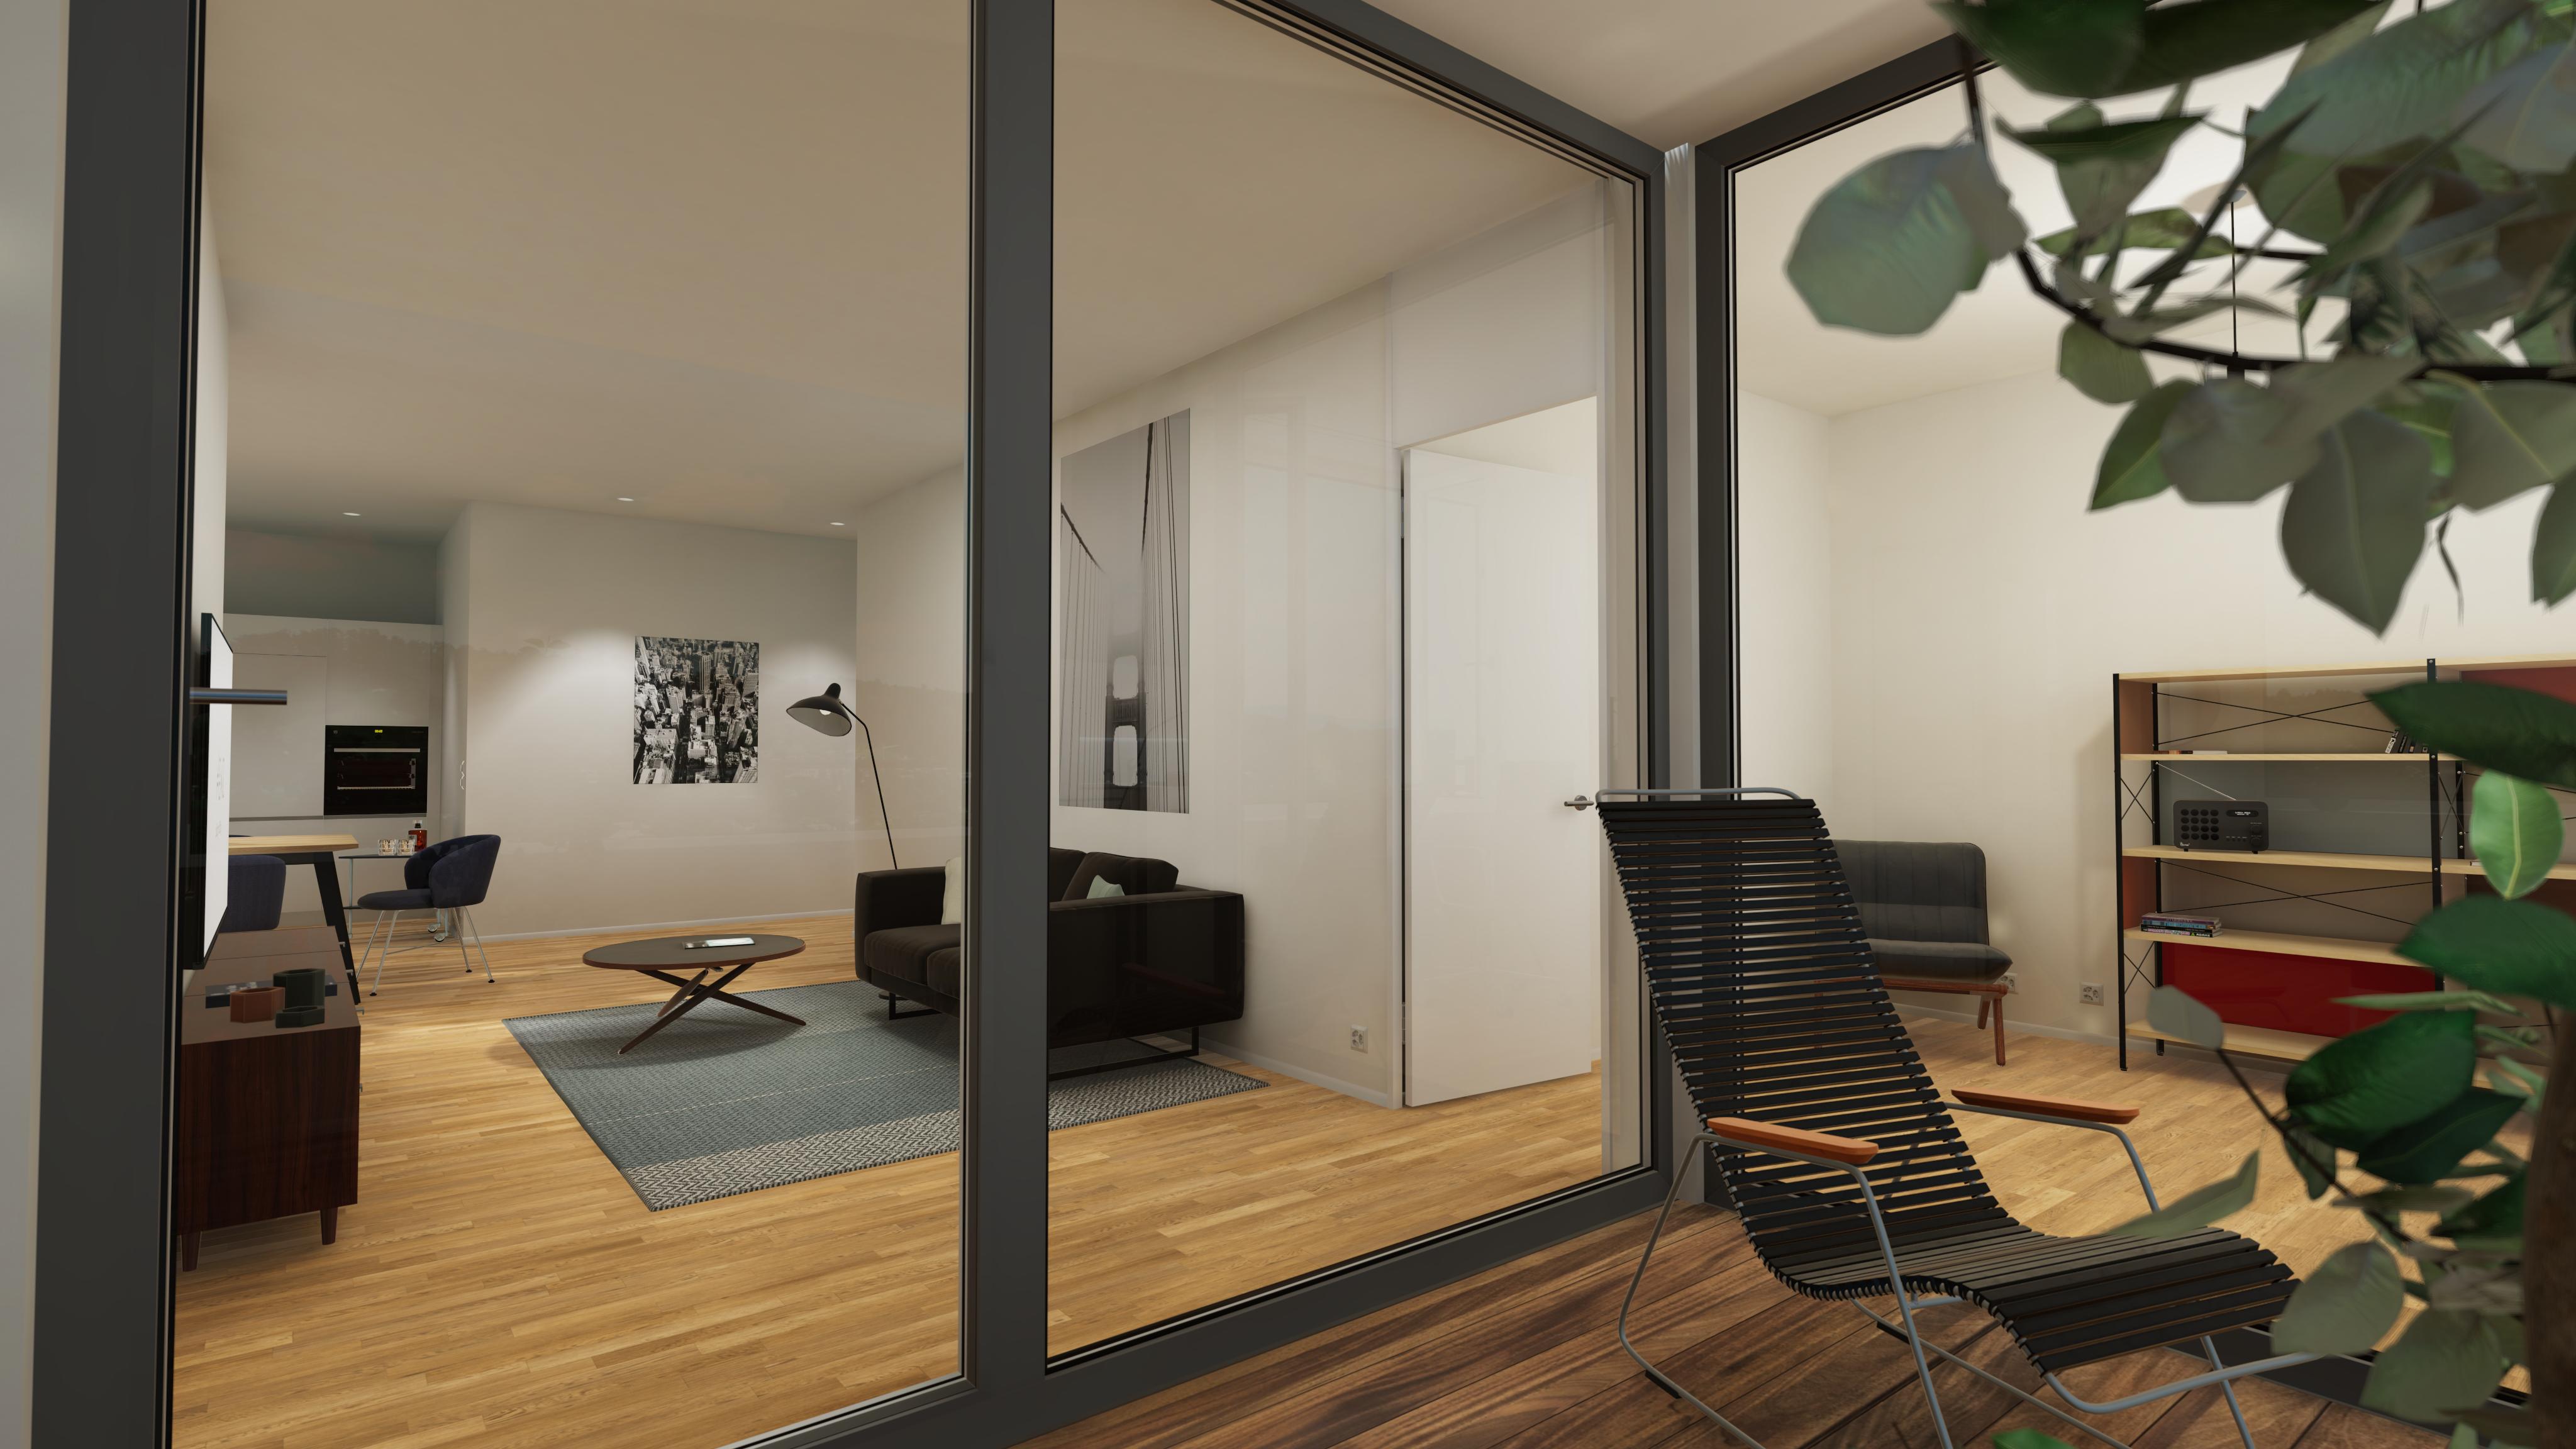 Halter Henz Apartment A - Loggia